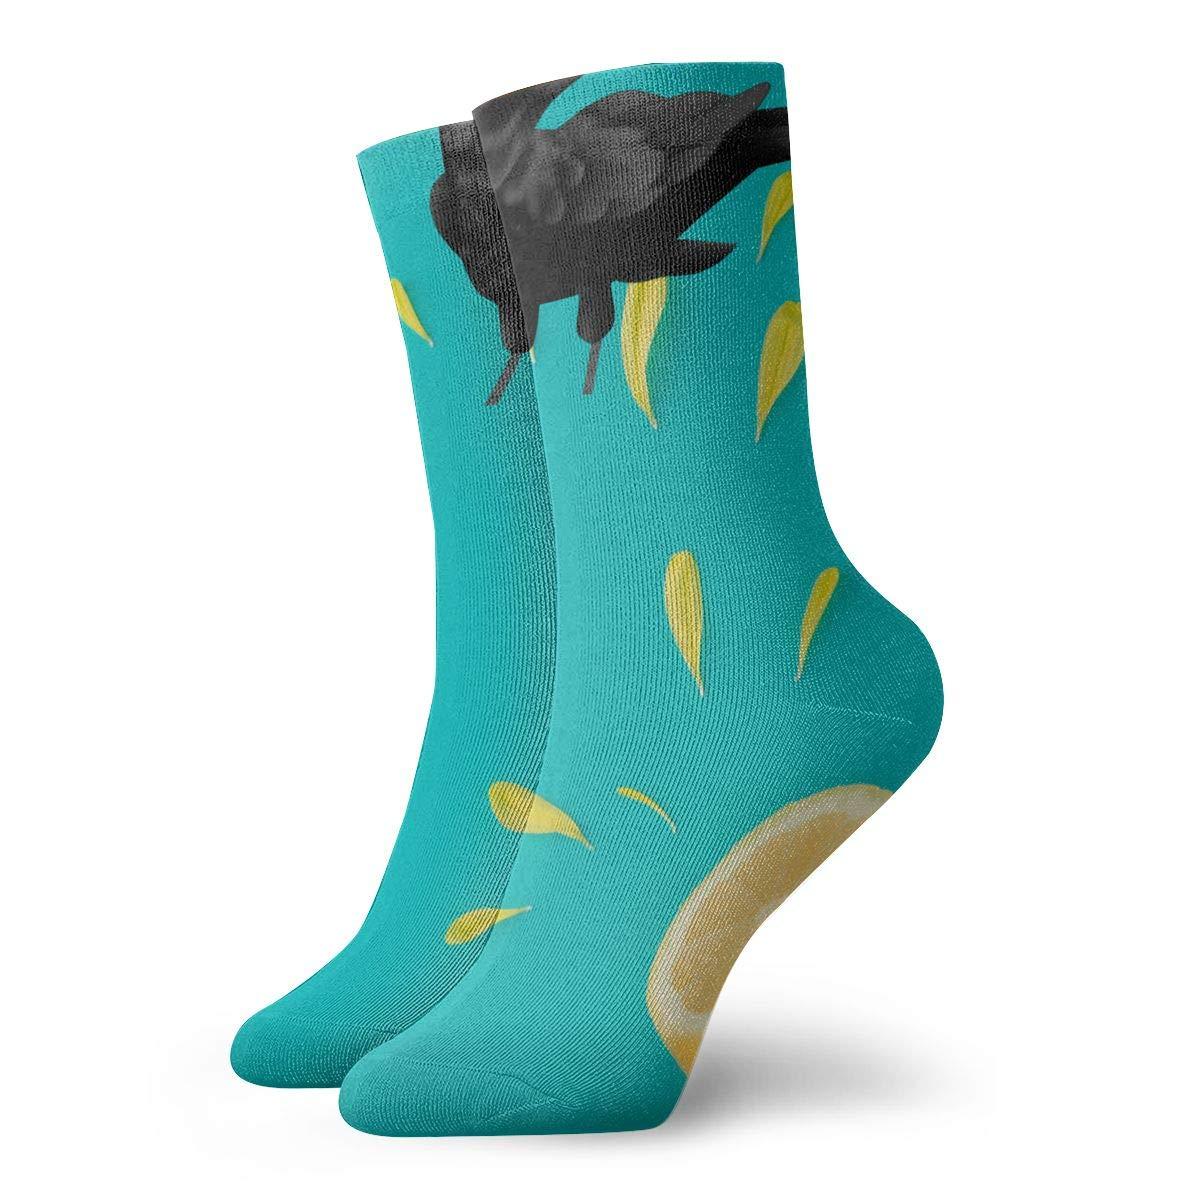 Red-Eyes Crow Fashion Dress Socks Short Socks Leisure Travel 11.8 Inch